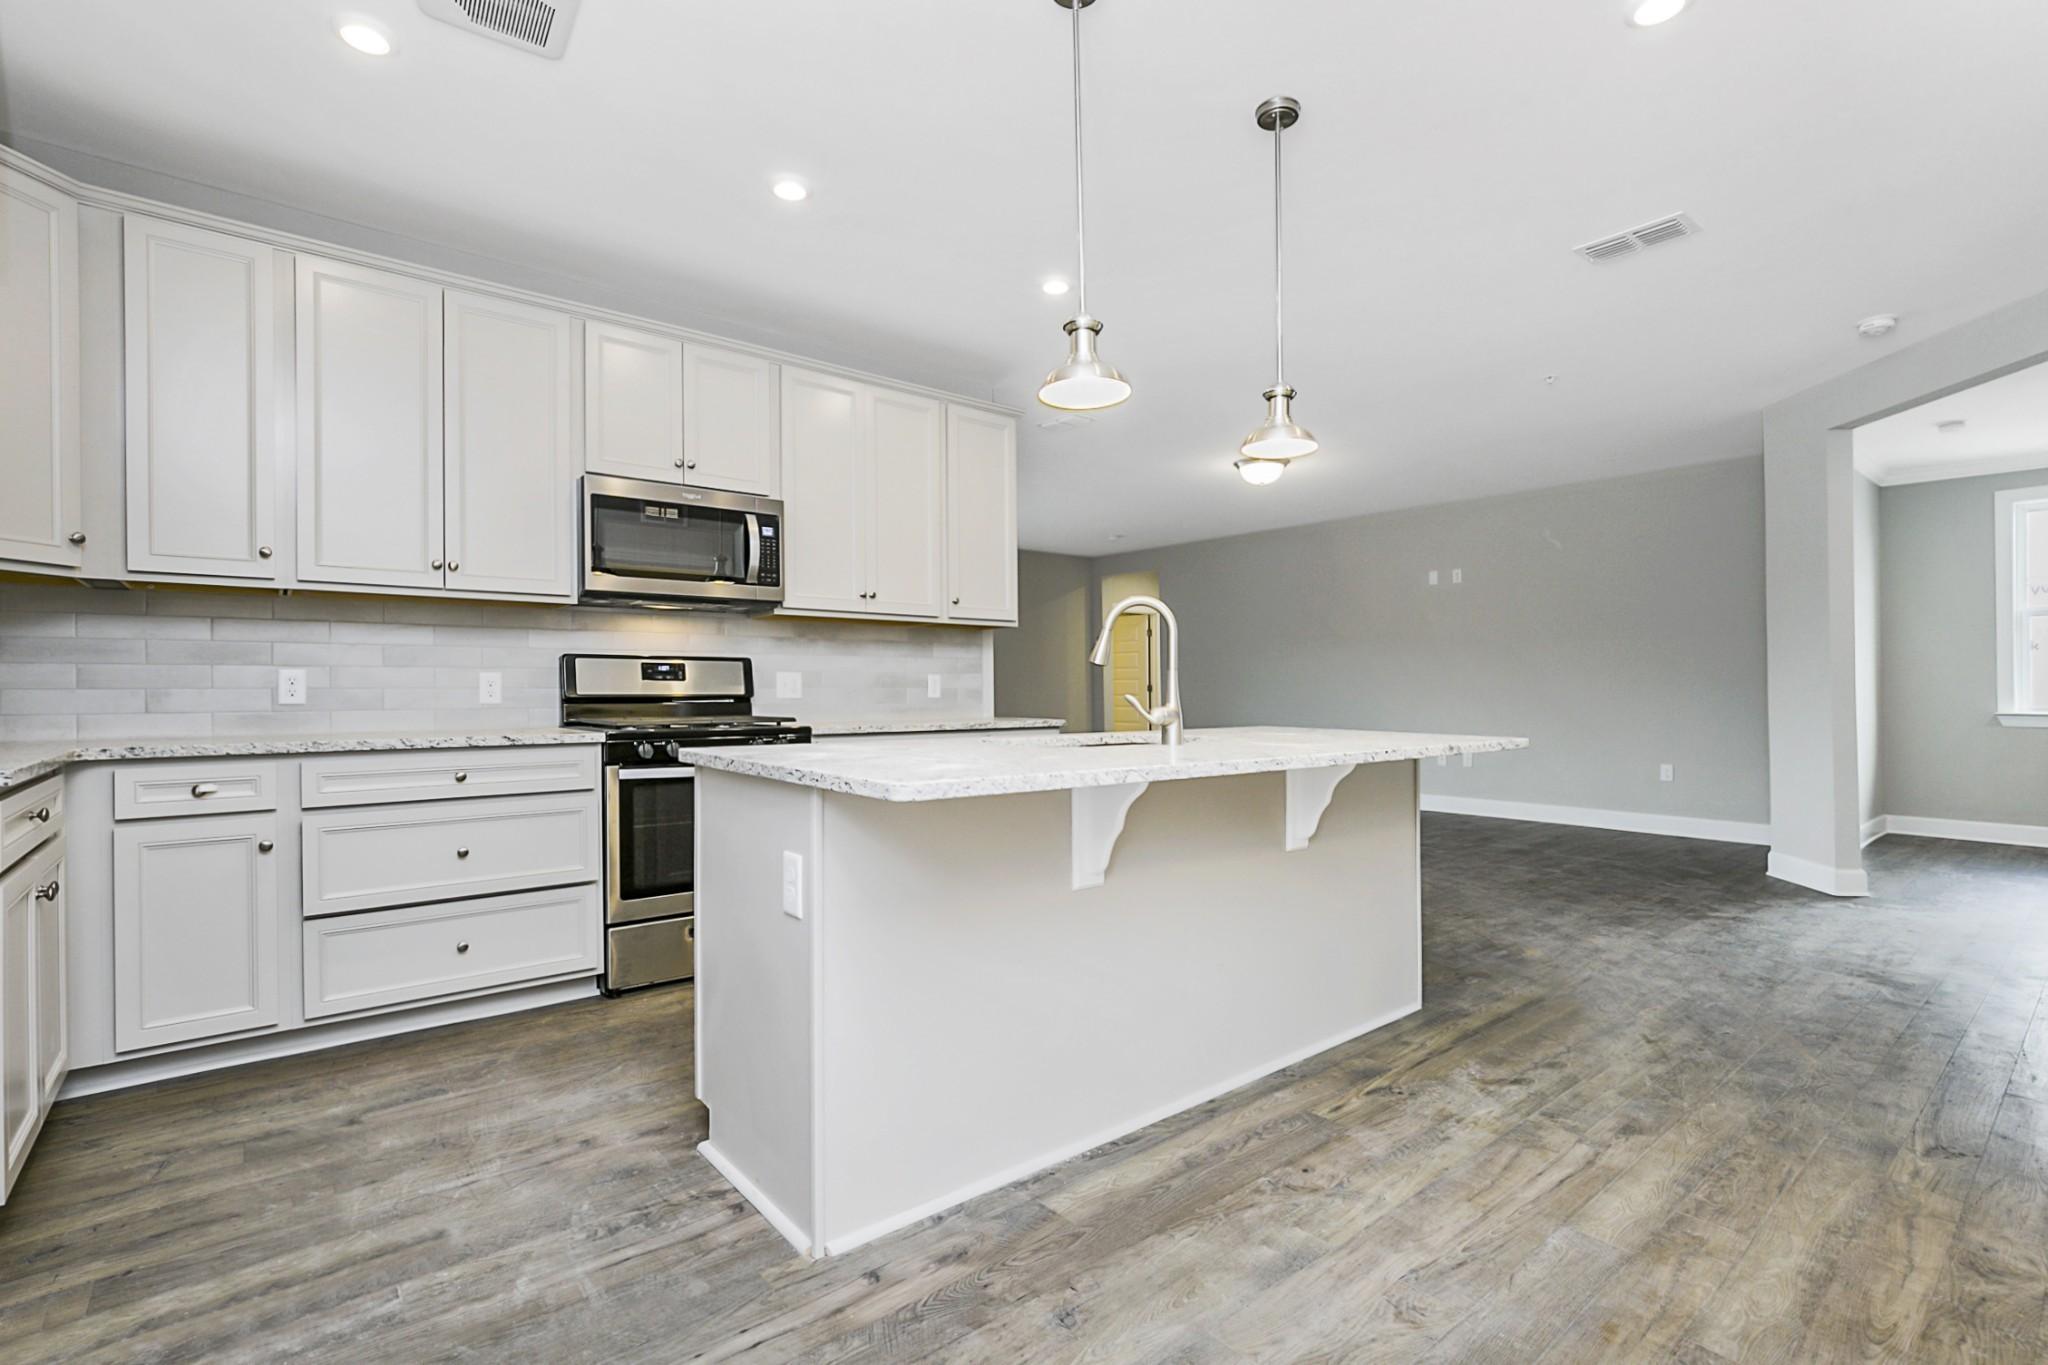 141 Saundersville Road #1207 Property Photo - Hendersonville, TN real estate listing